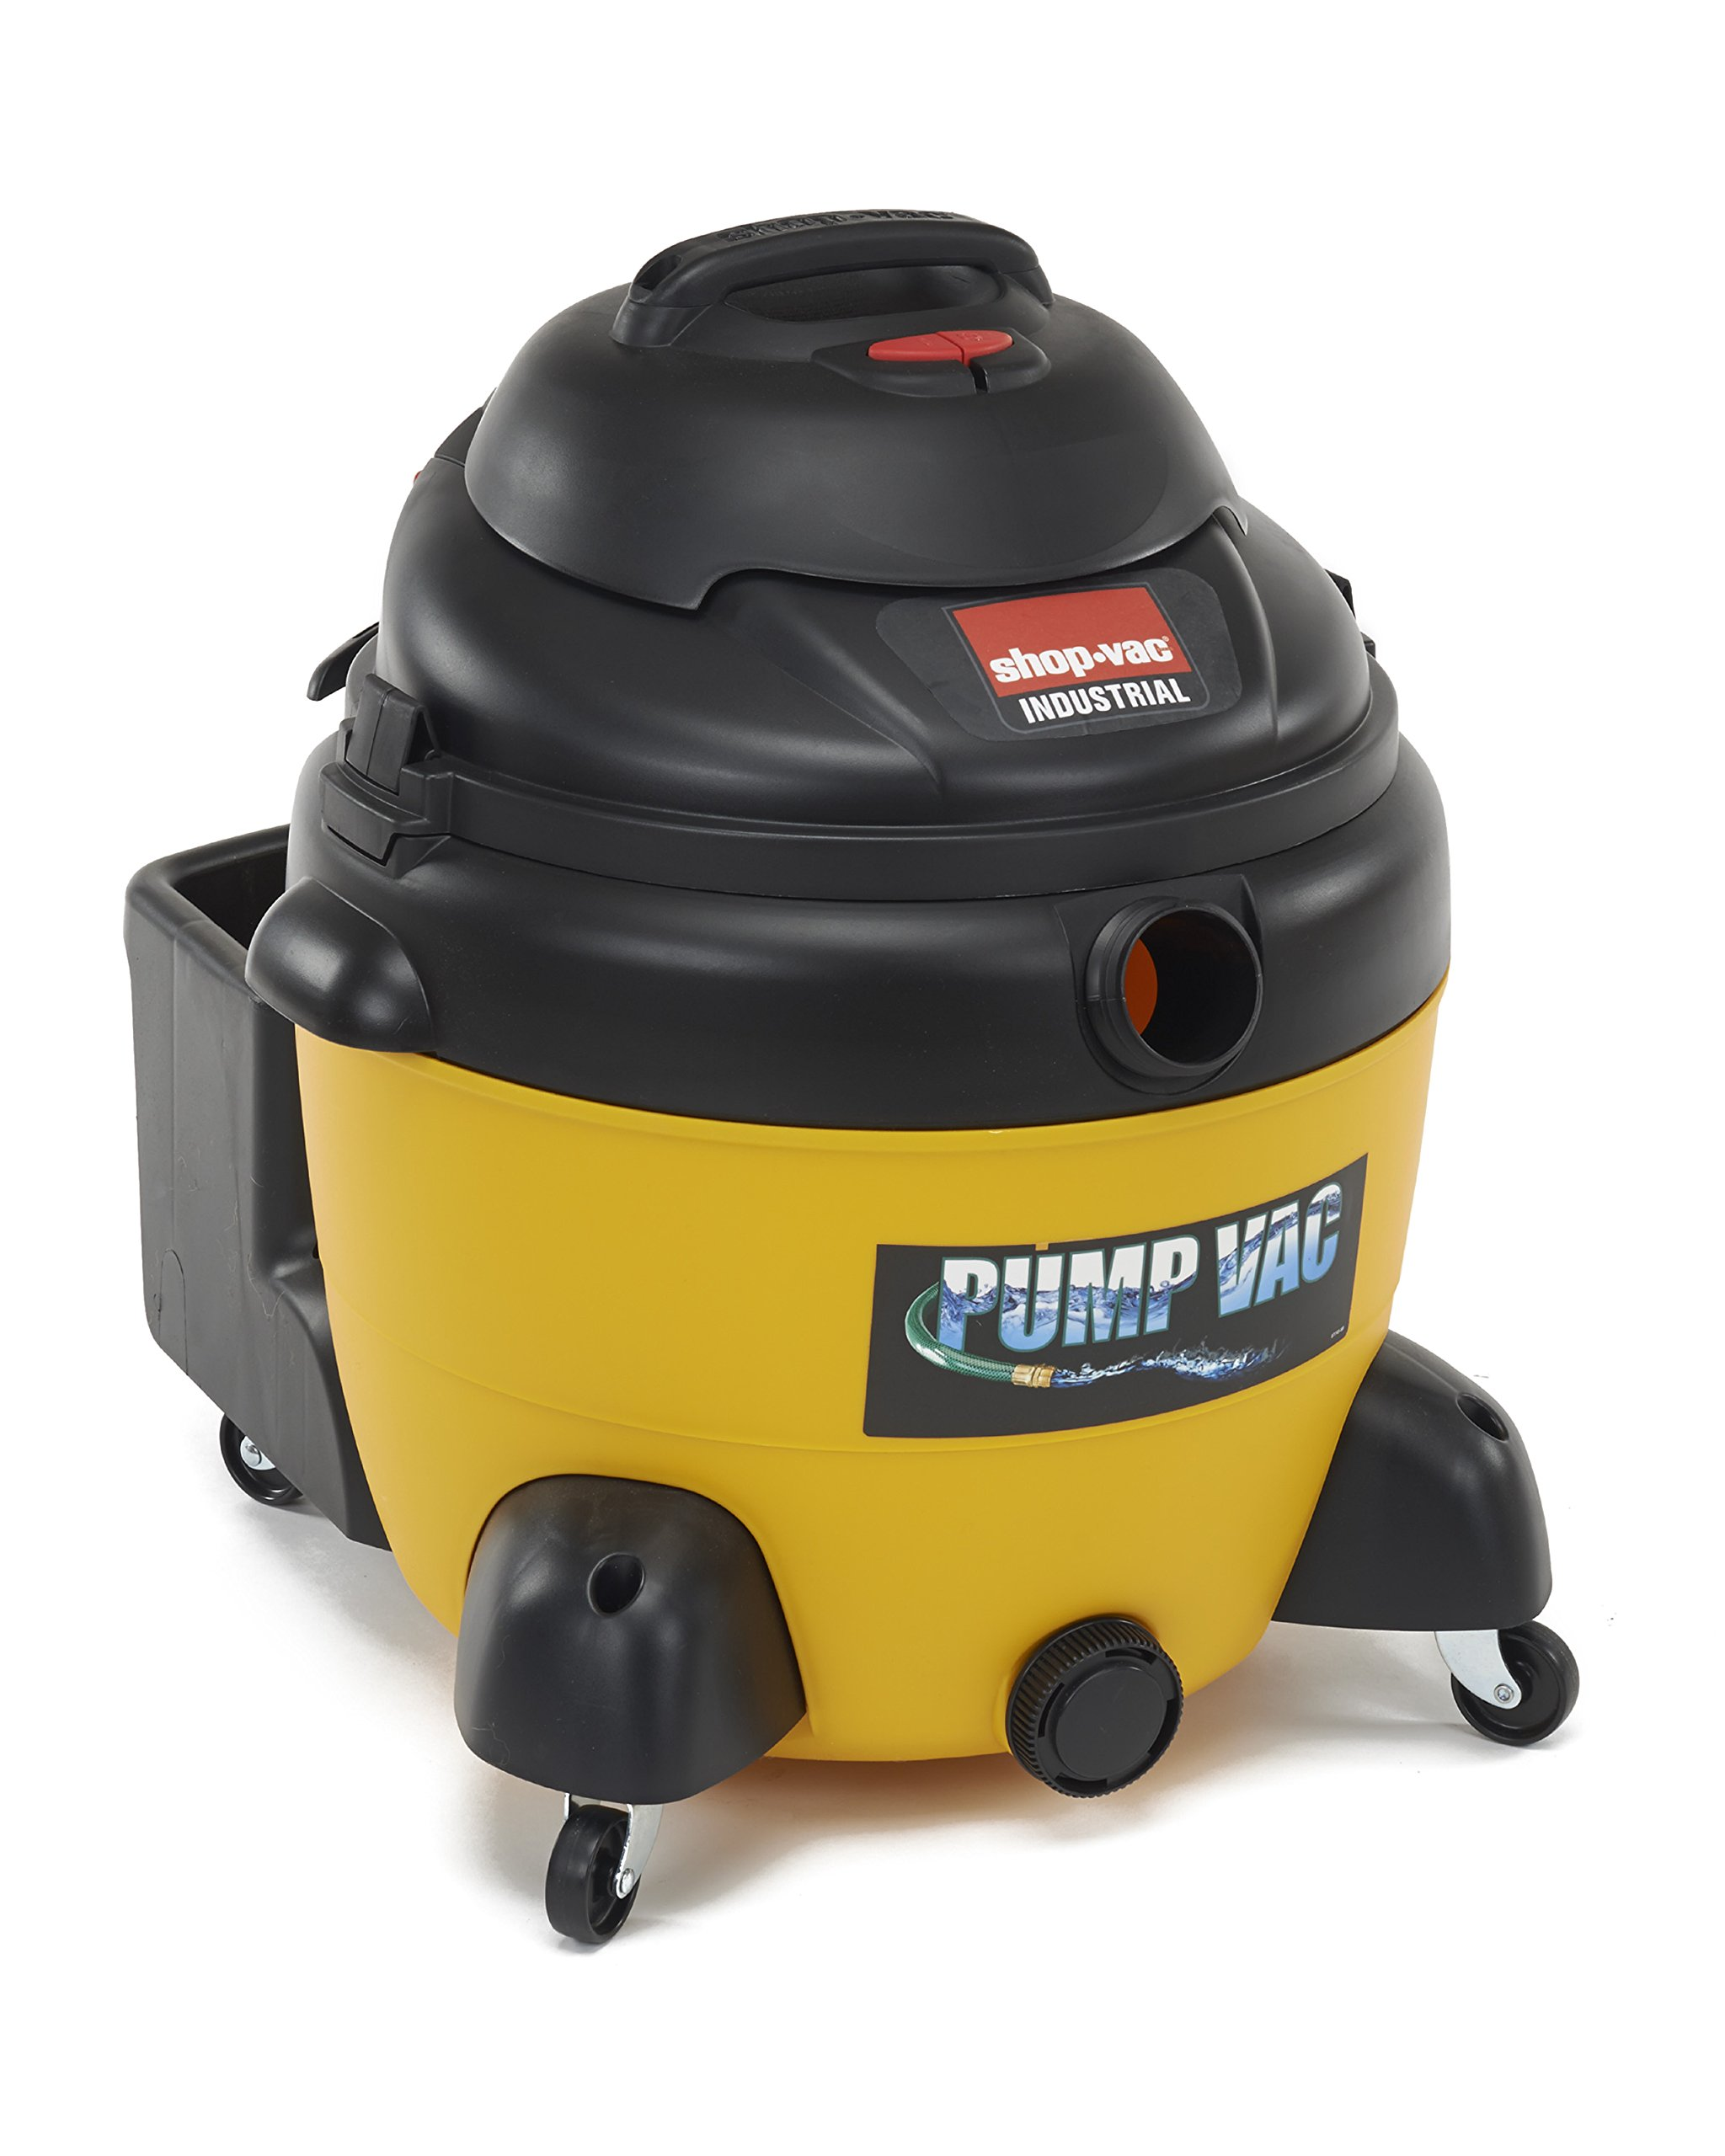 Shop-Vac 9604610 6.5 Peak HP wet Dry Vacuum with Built in Pump, 16-Gallon